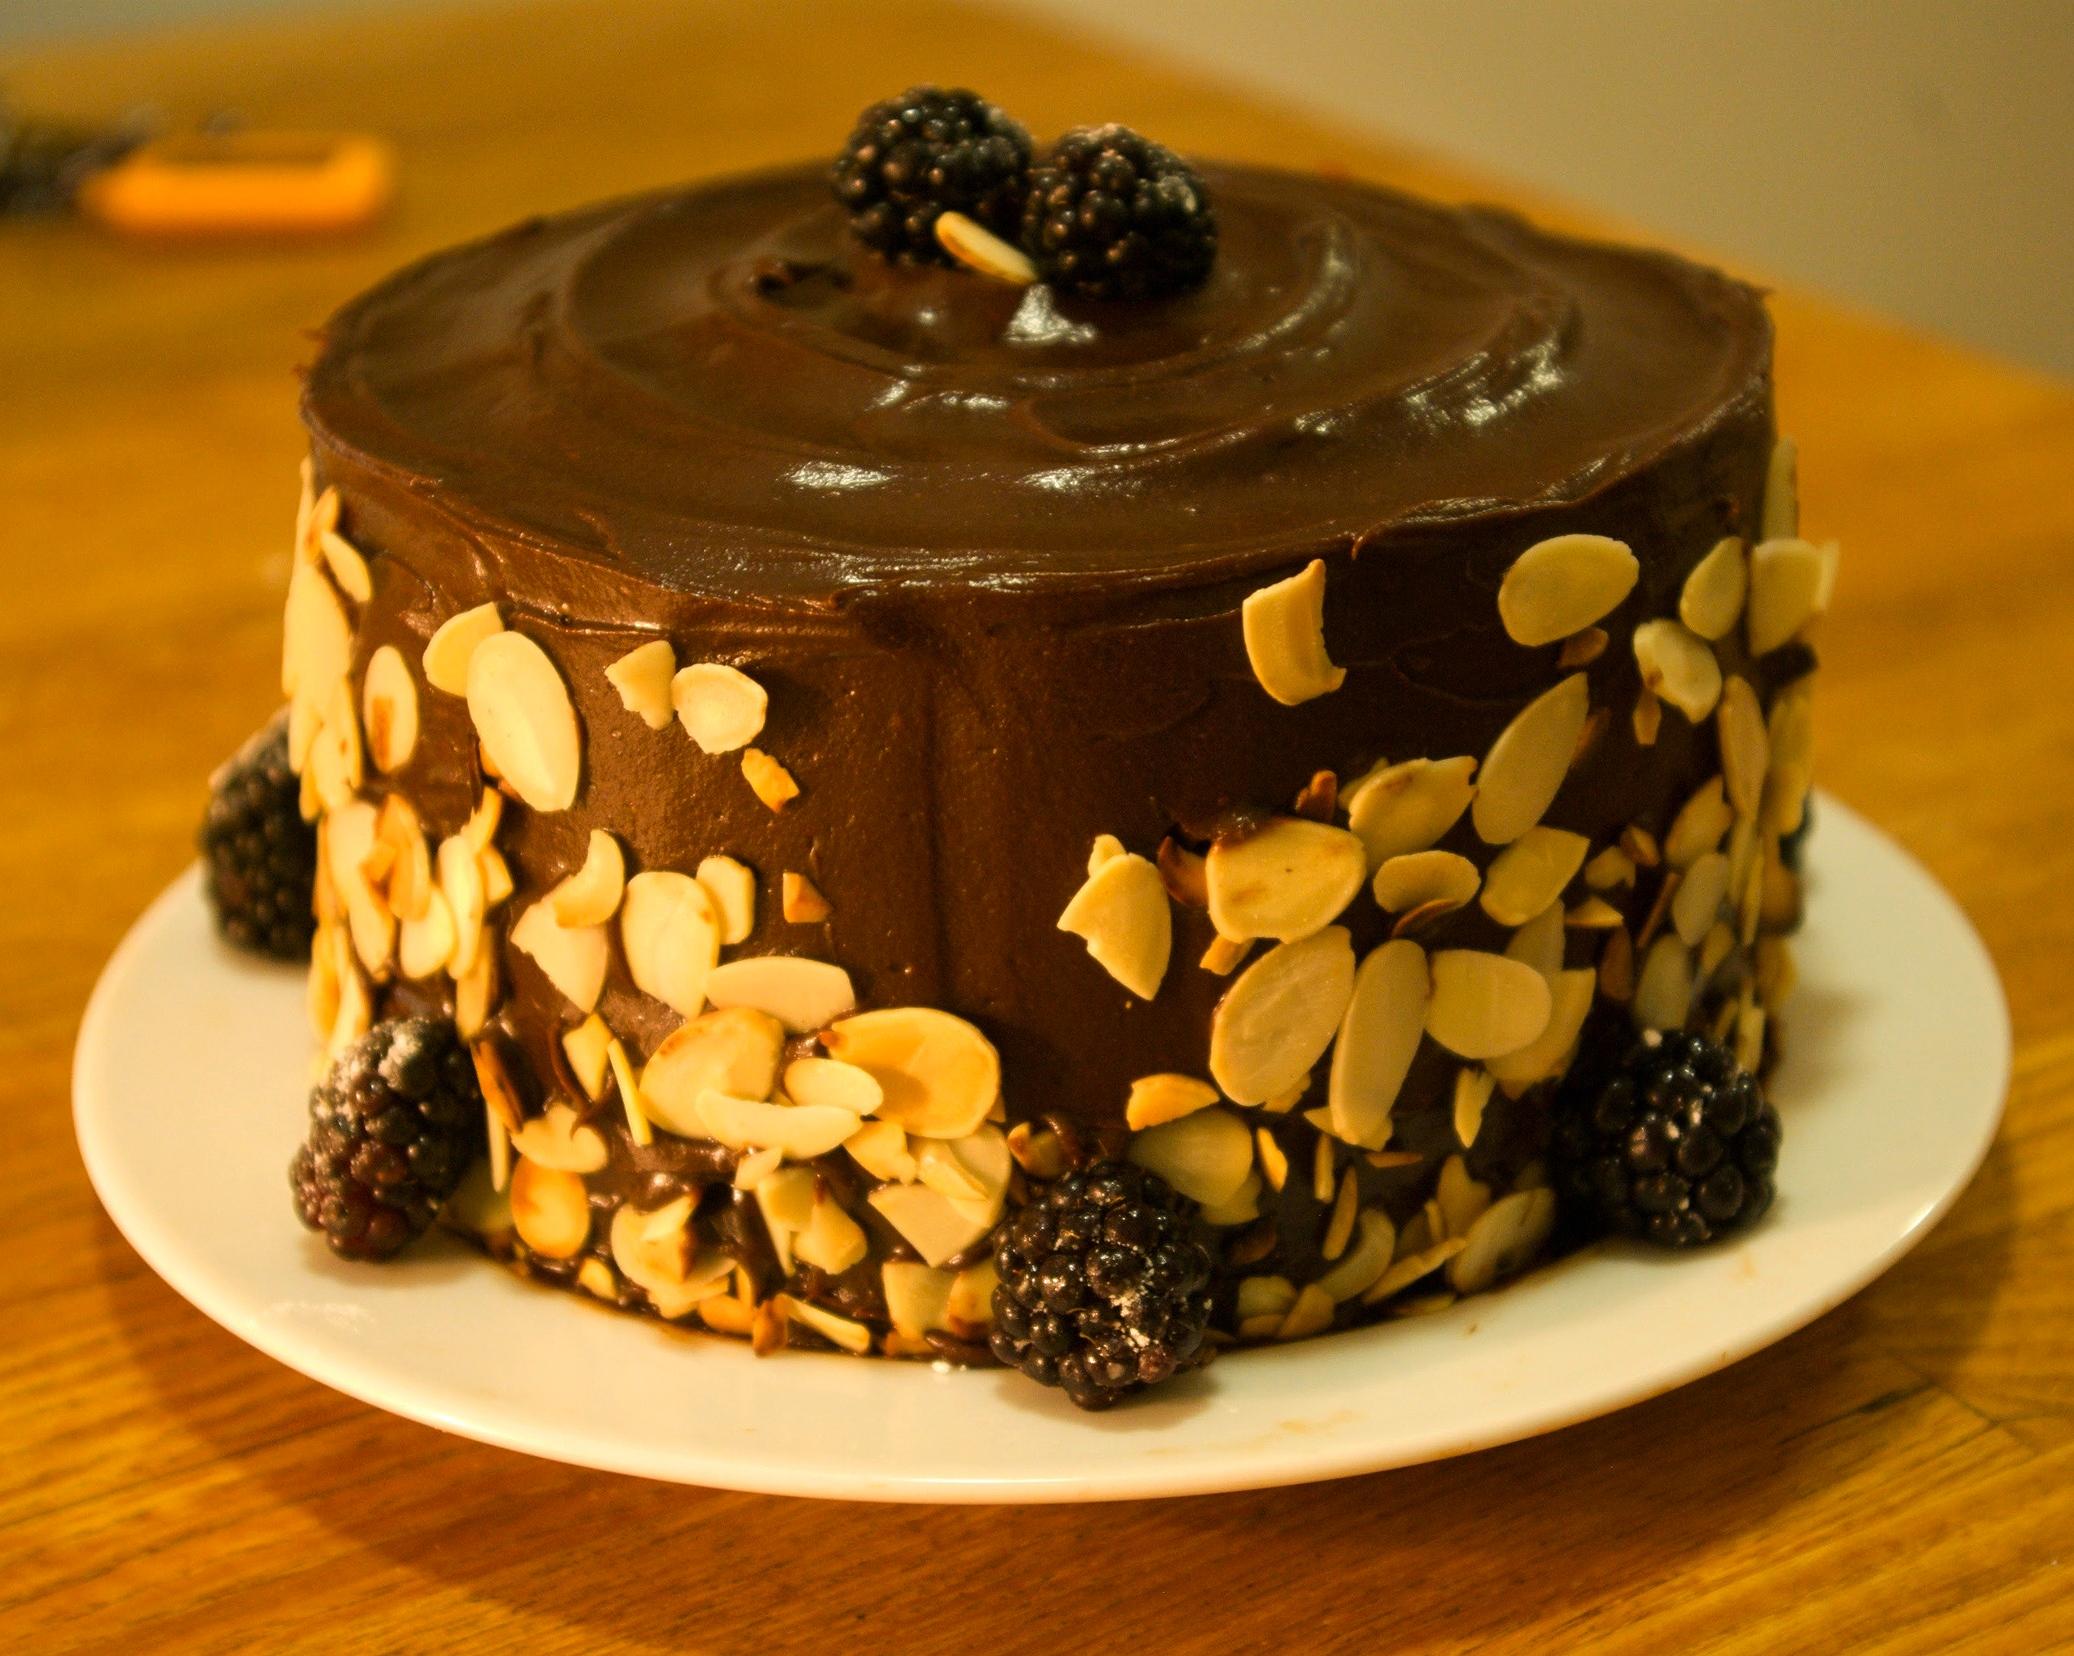 Blackberry buttermilk spice cake with bittersweet chocolate ganache